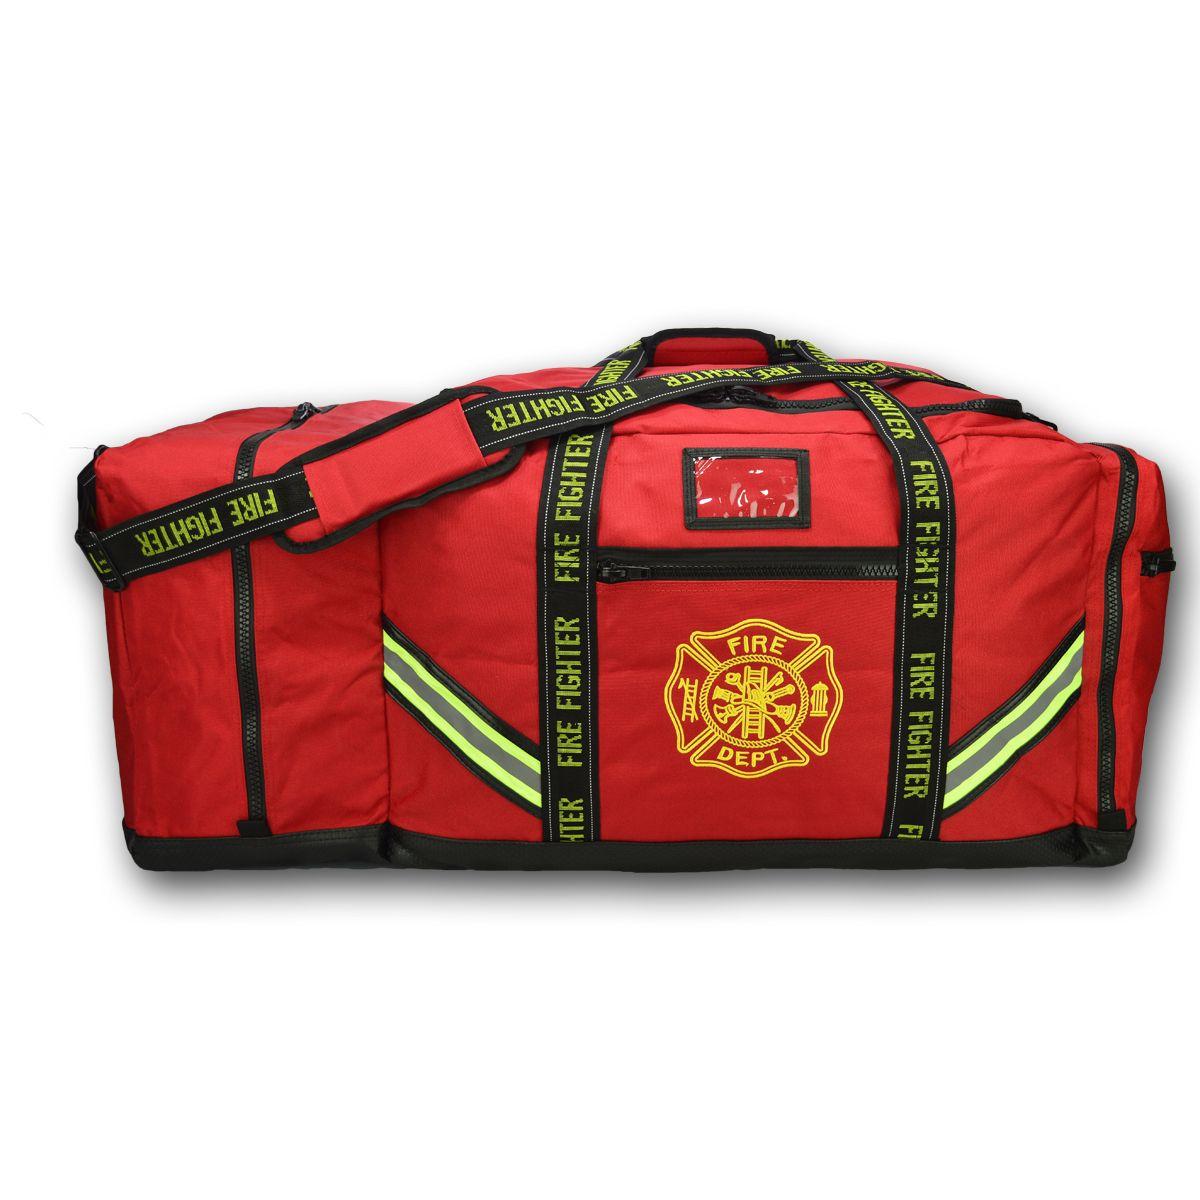 Lightning 3XL Firefighter Step-In Turnout Gear Bag